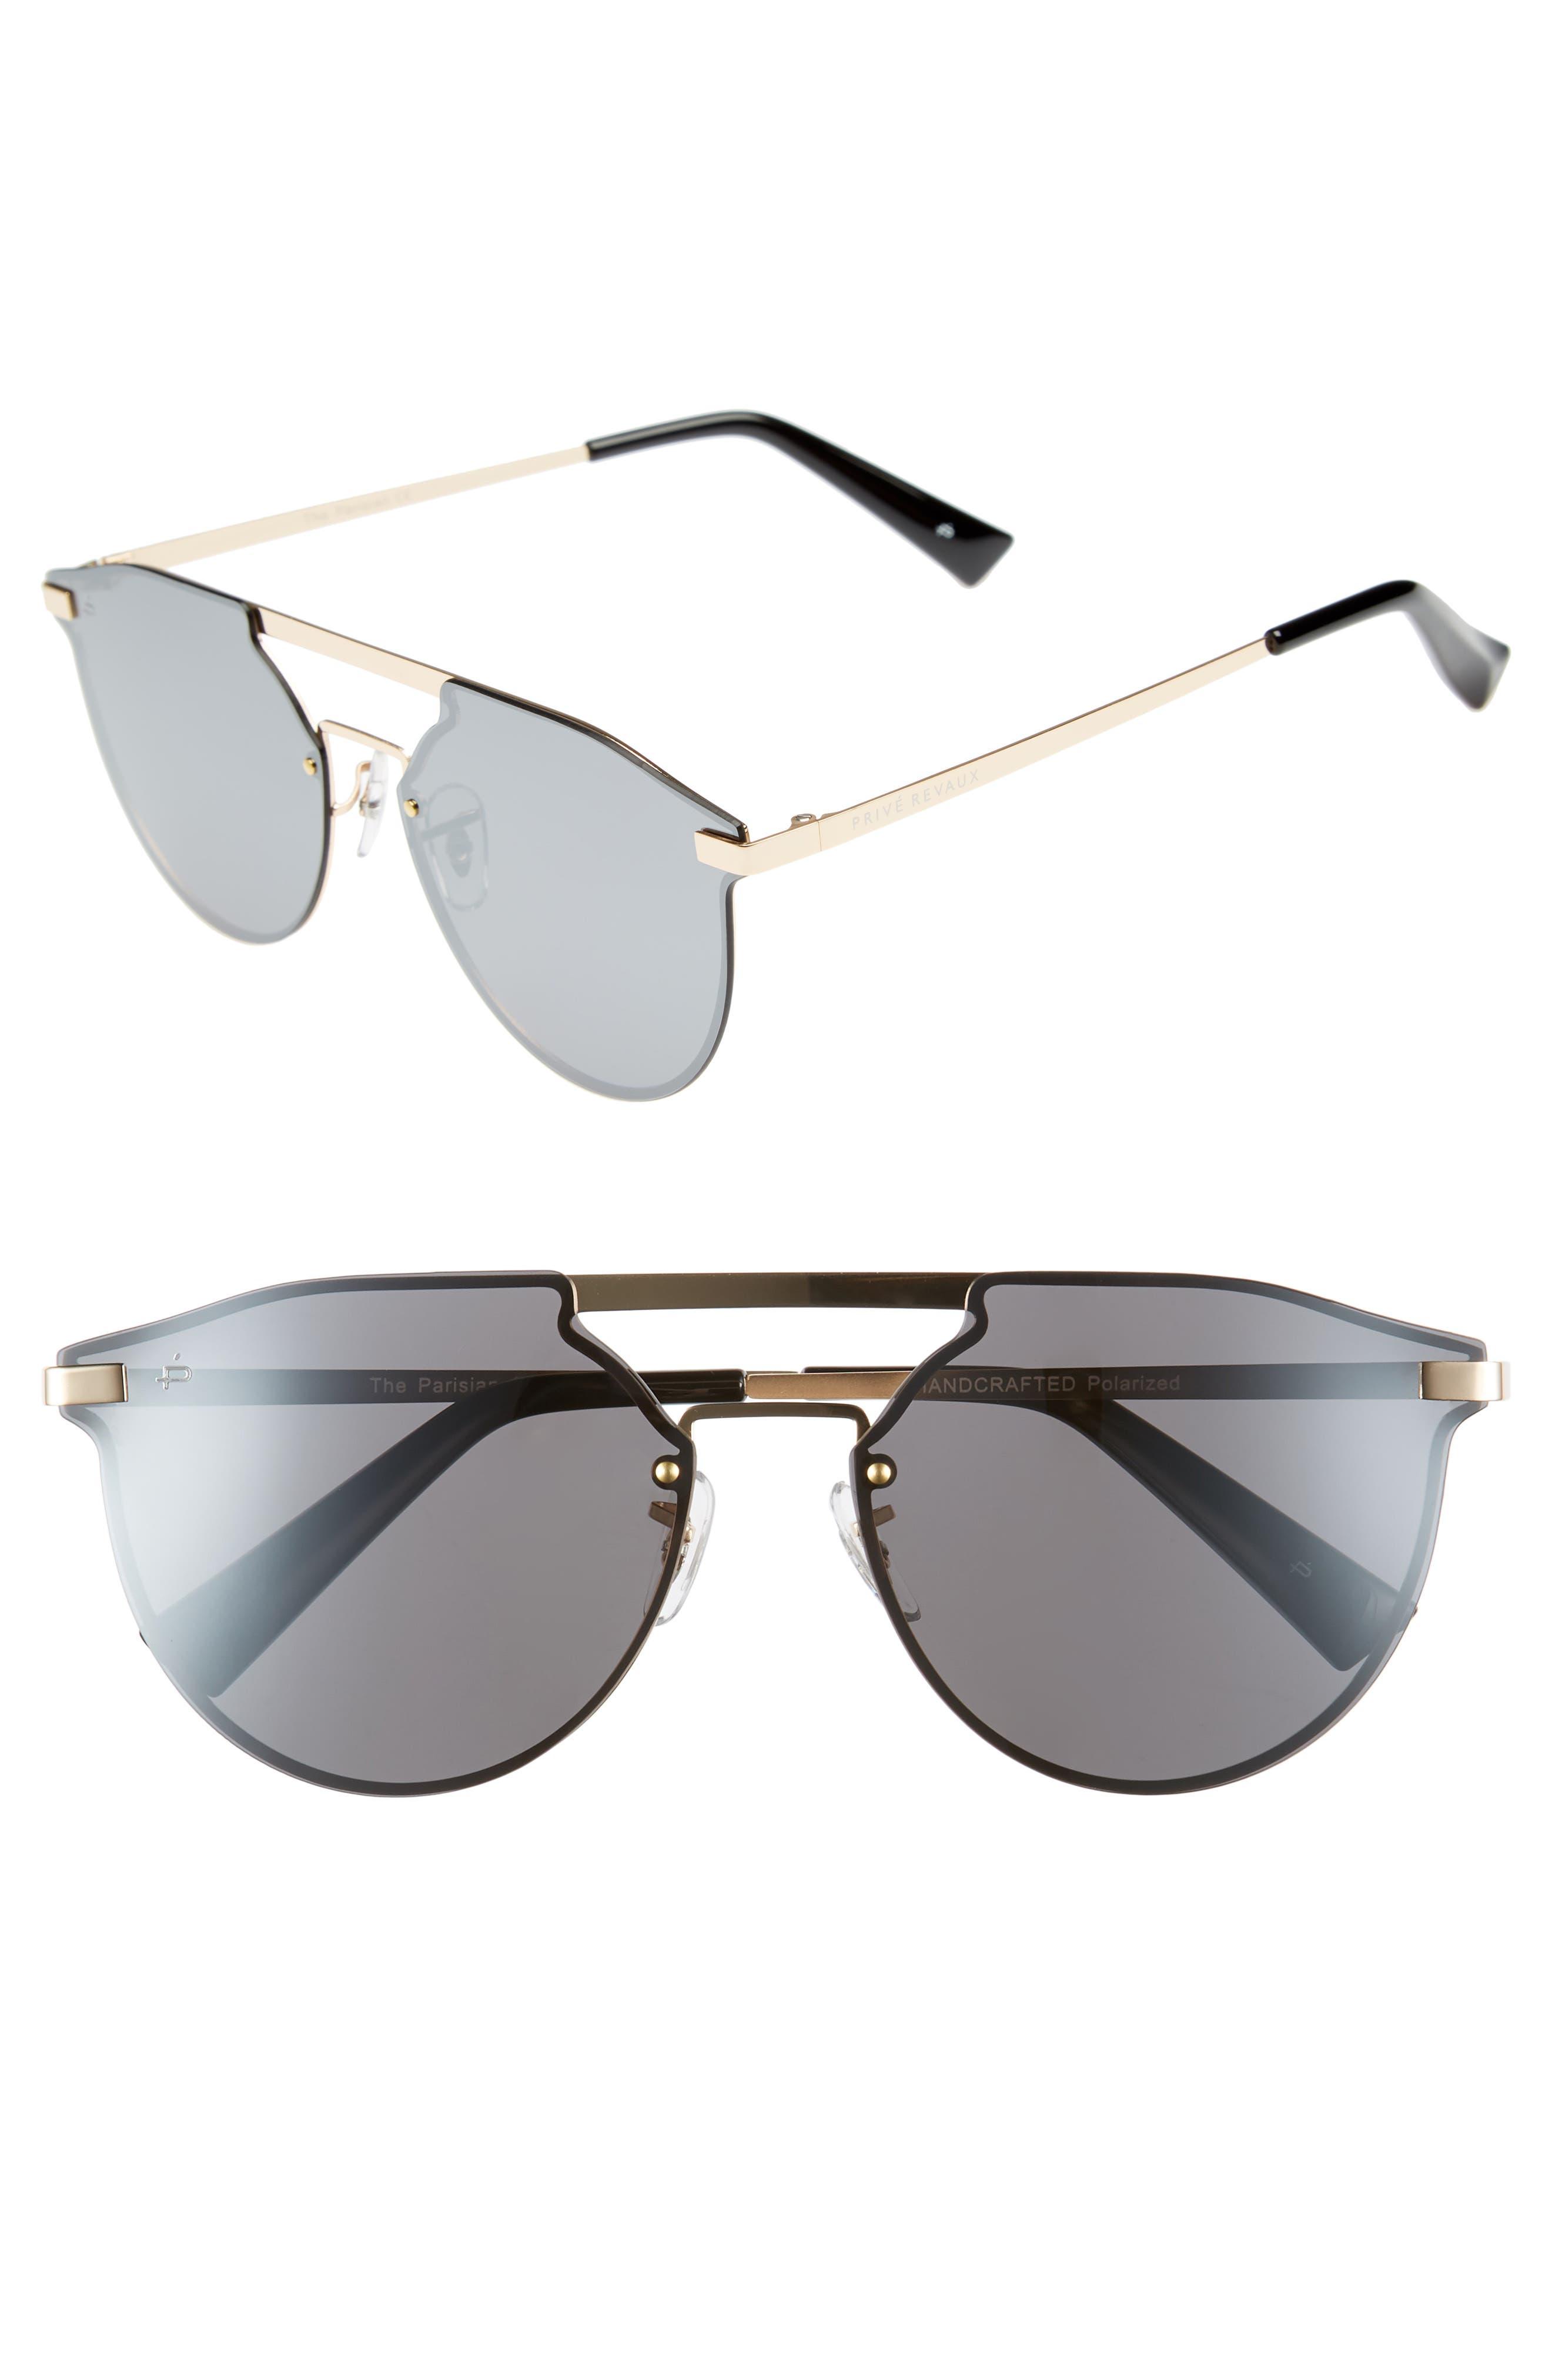 Alternate Image 1 Selected - Privé Revaux The Parisian 62mm Aviator Sunglasses